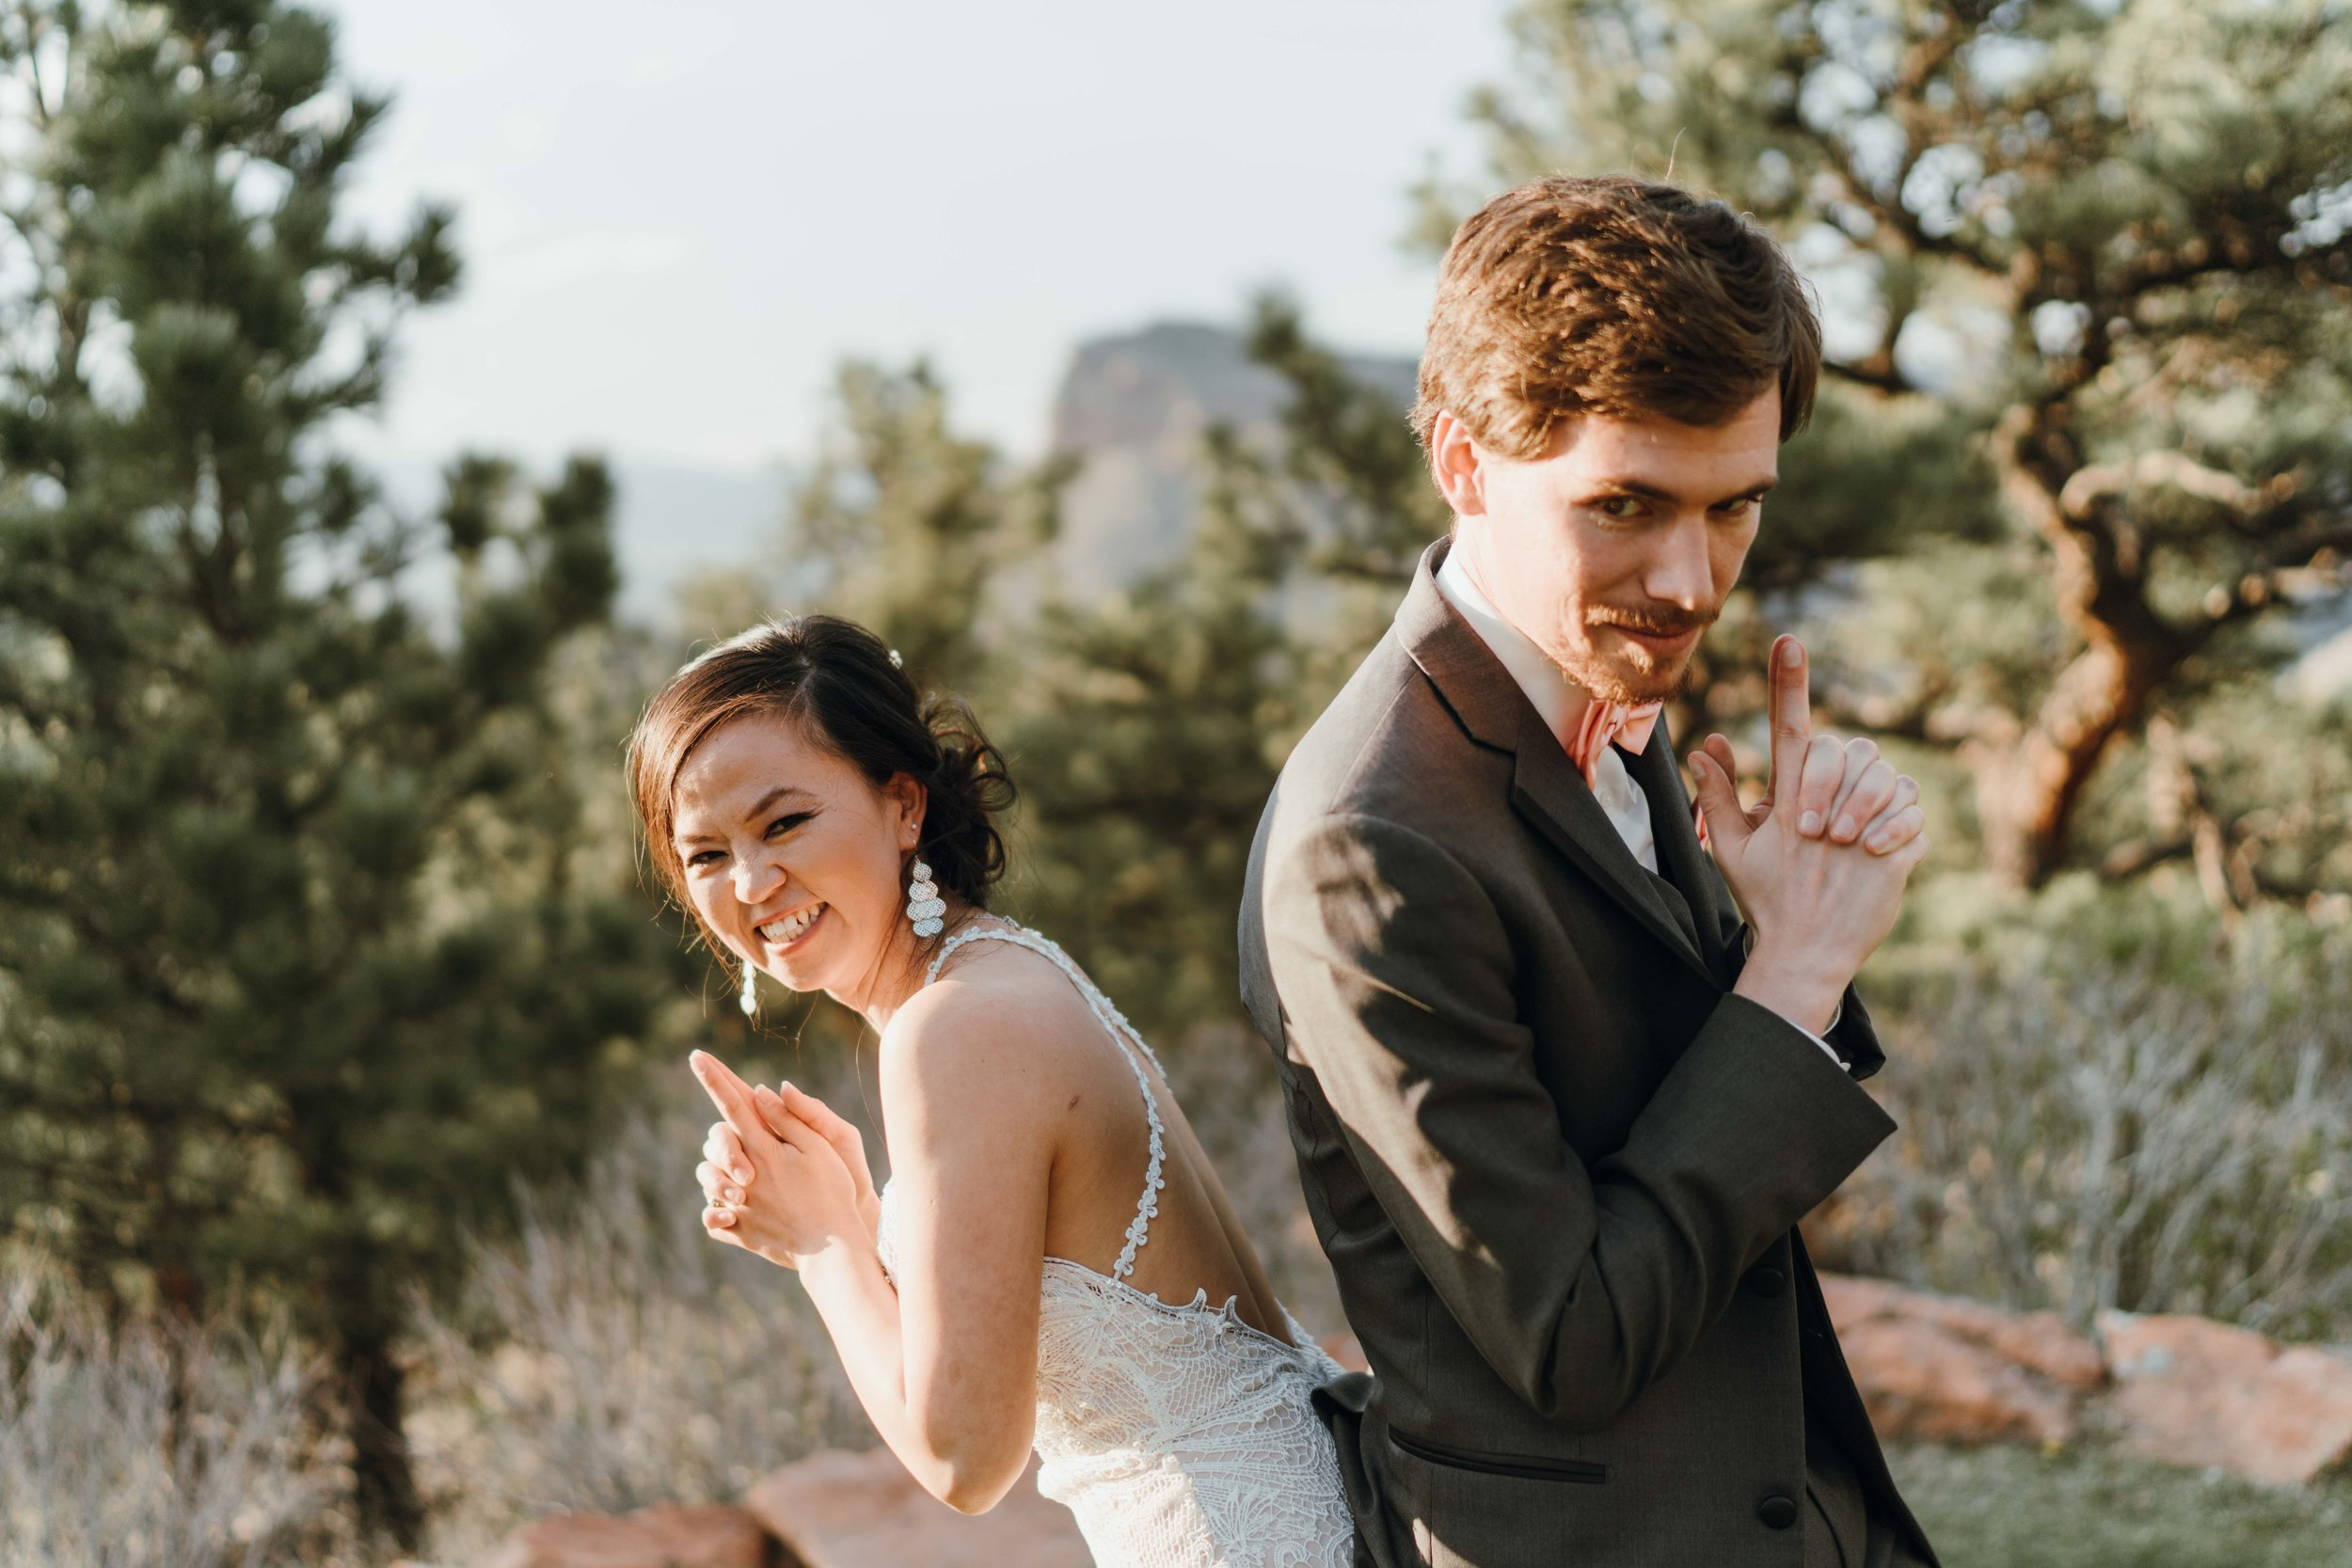 denver wedding photographer lioncrest manor in lyons ben and mali -DSC06490.jpg